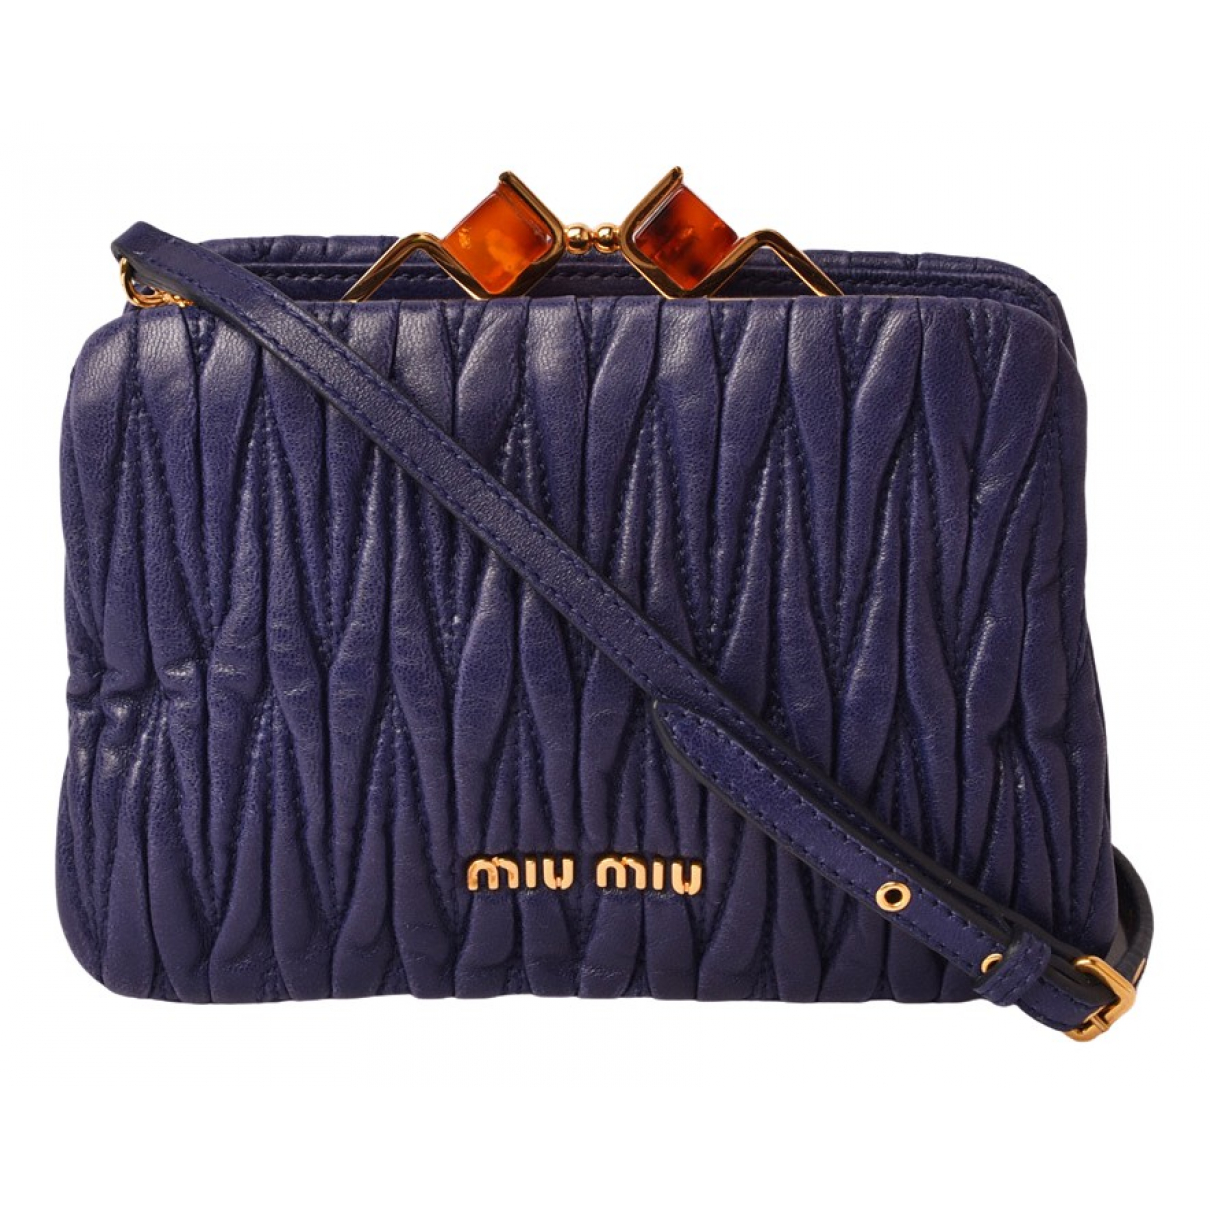 Miu Miu Matelassé Blue Leather handbag for Women N